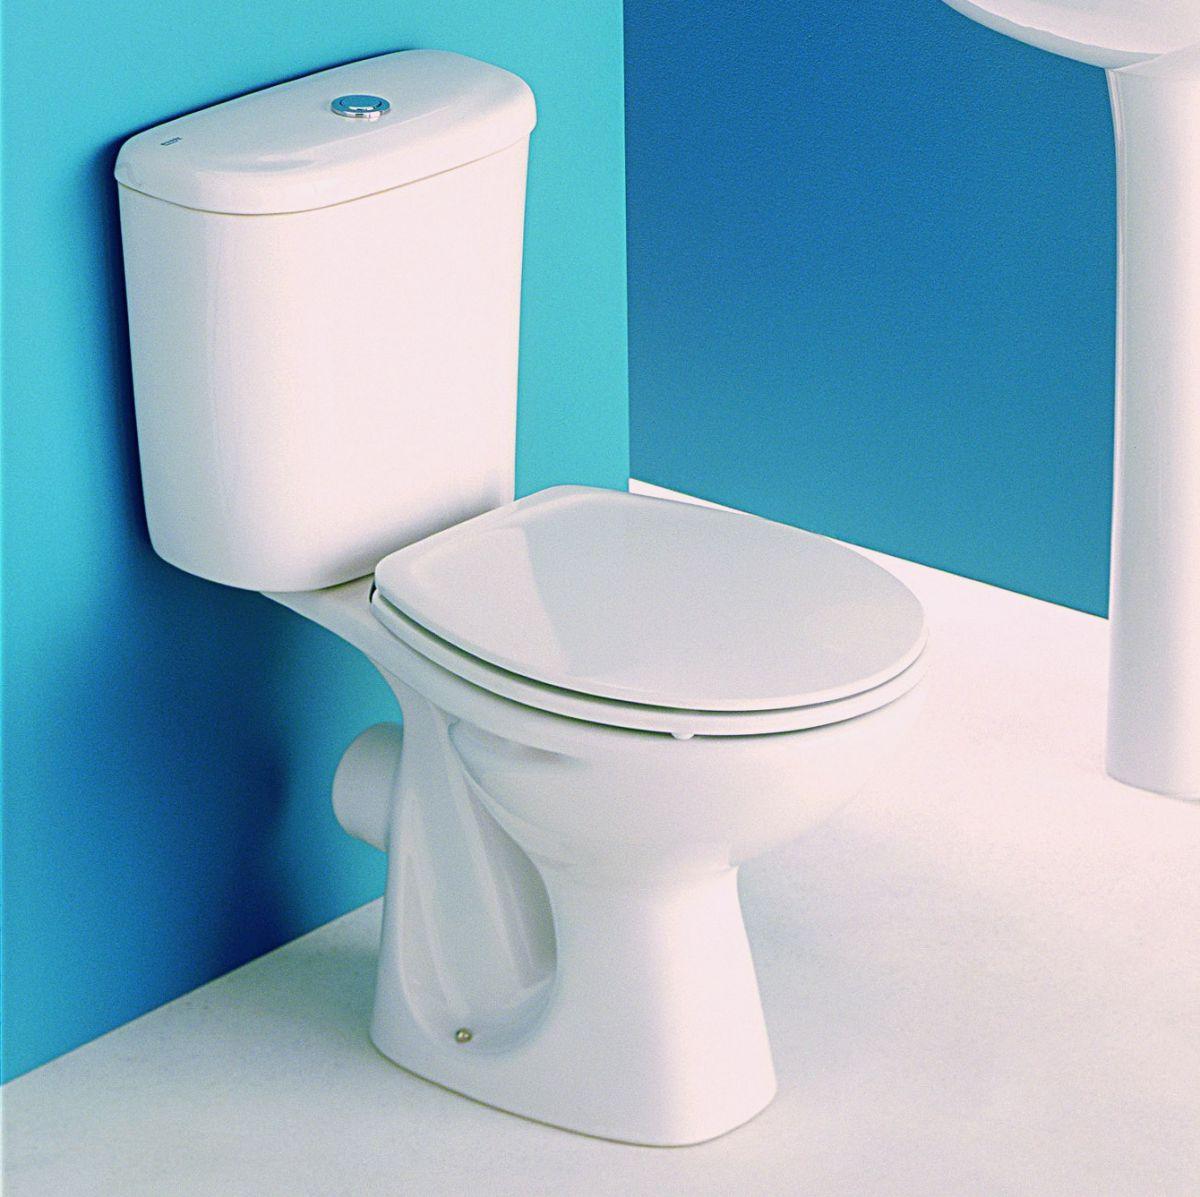 roca polo close coupled toilet including seat uk bathrooms. Black Bedroom Furniture Sets. Home Design Ideas